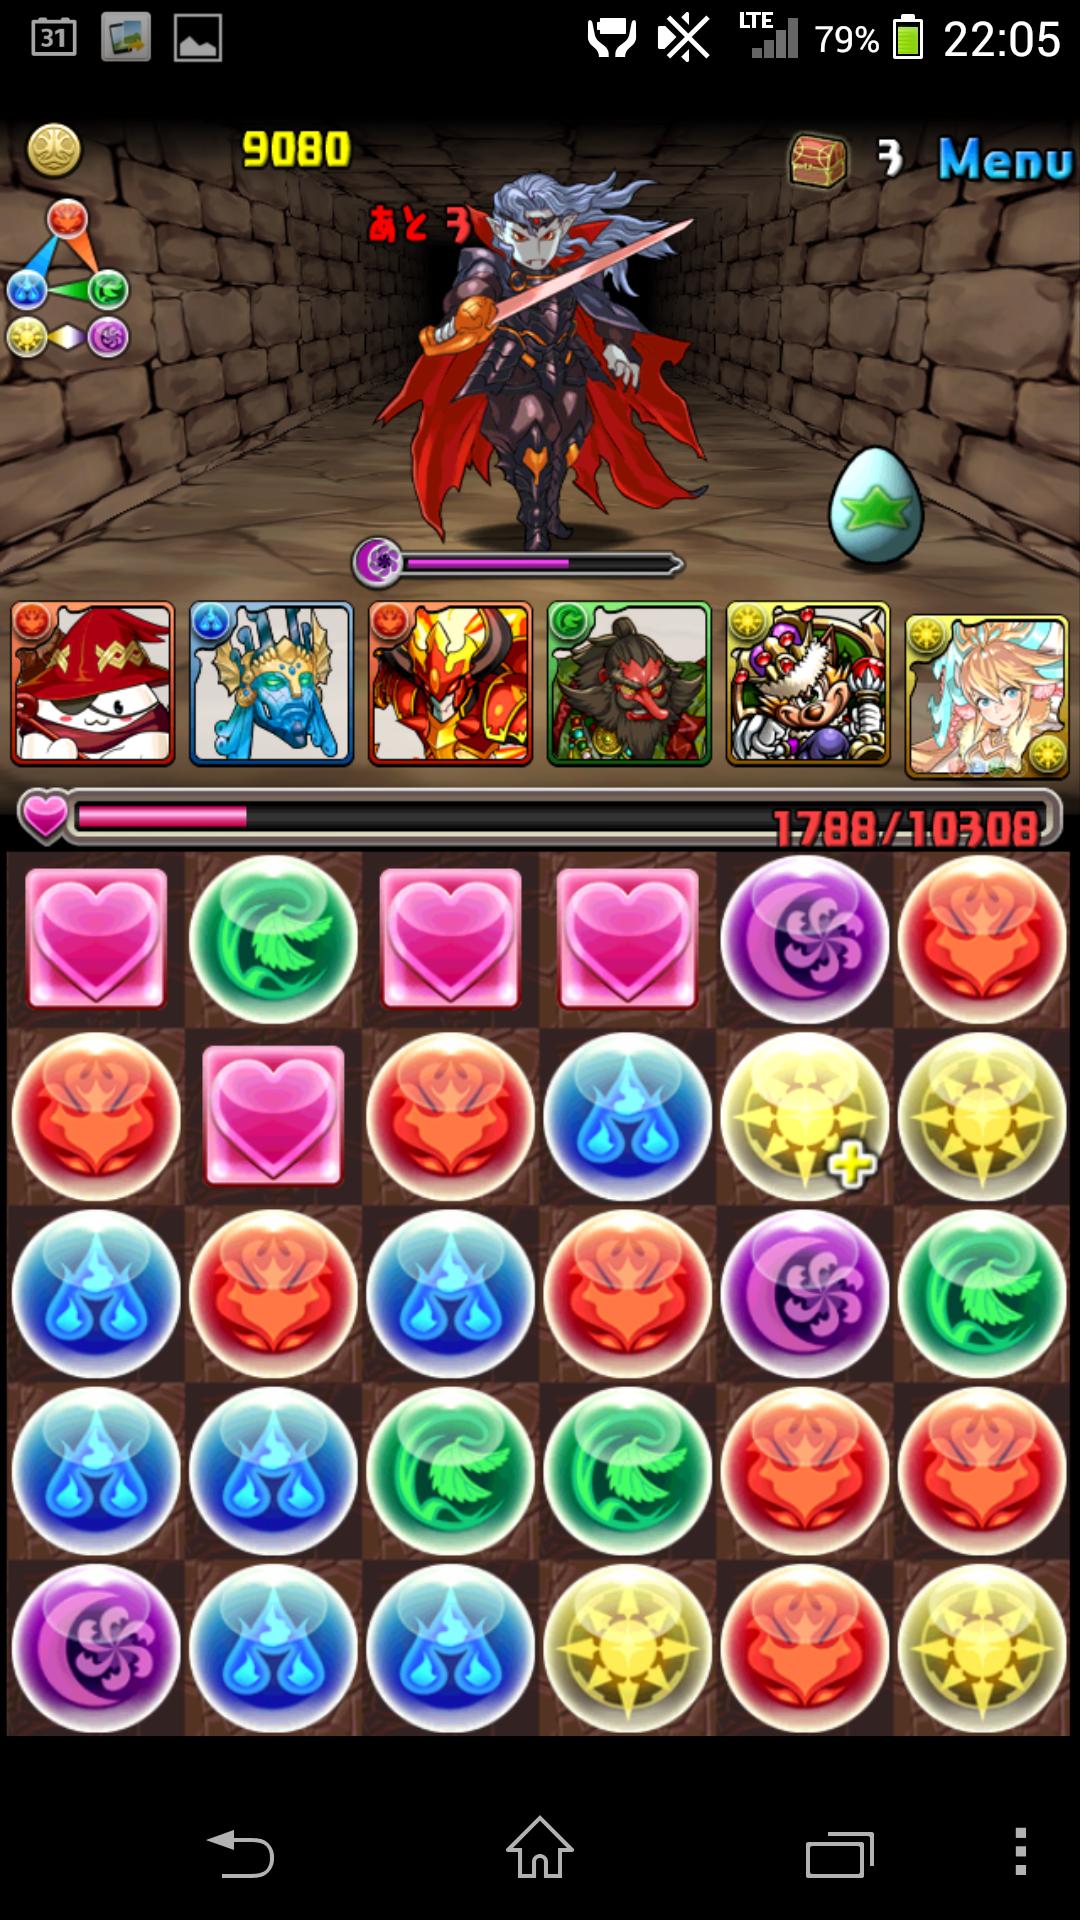 Screenshot_2014-05-12-22-05-25.png